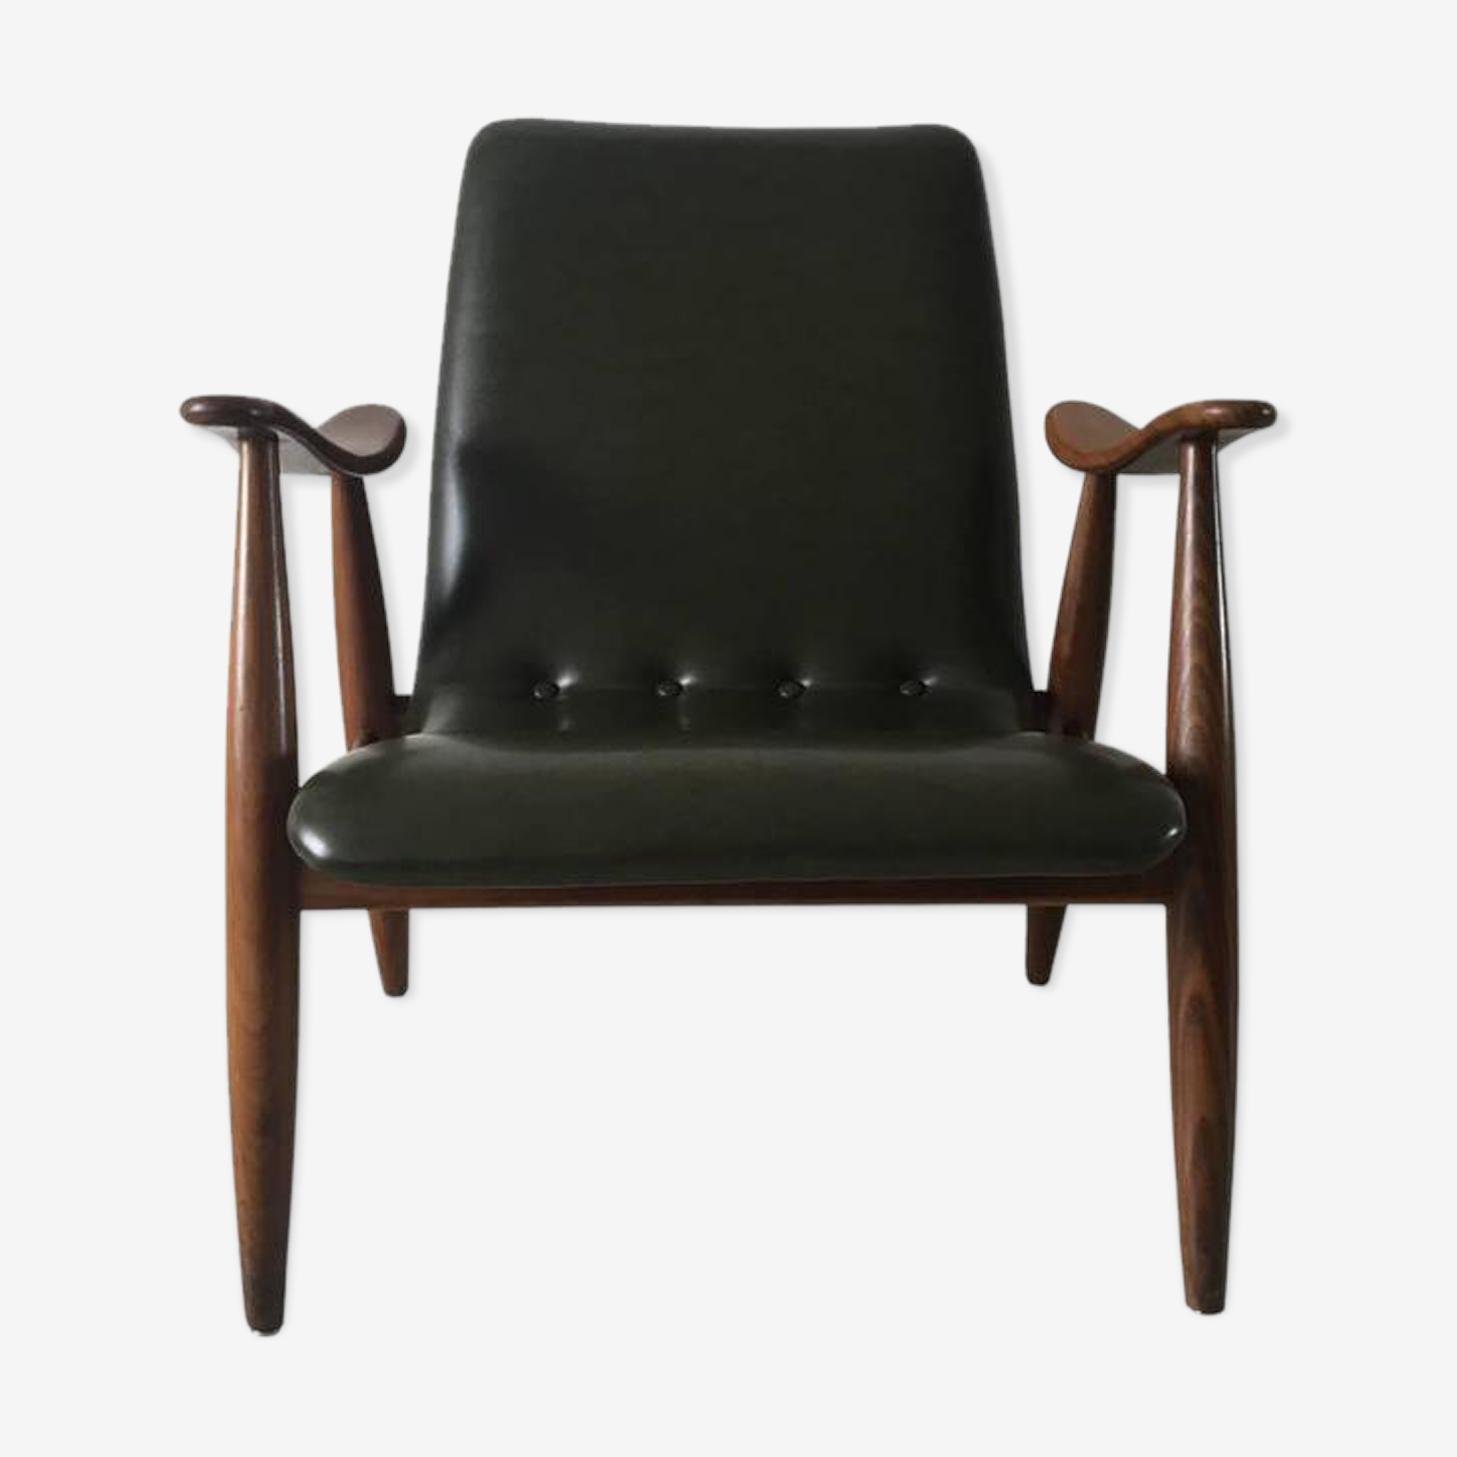 Armchair by Louis Van Teeffelen for modernly, 1960 s